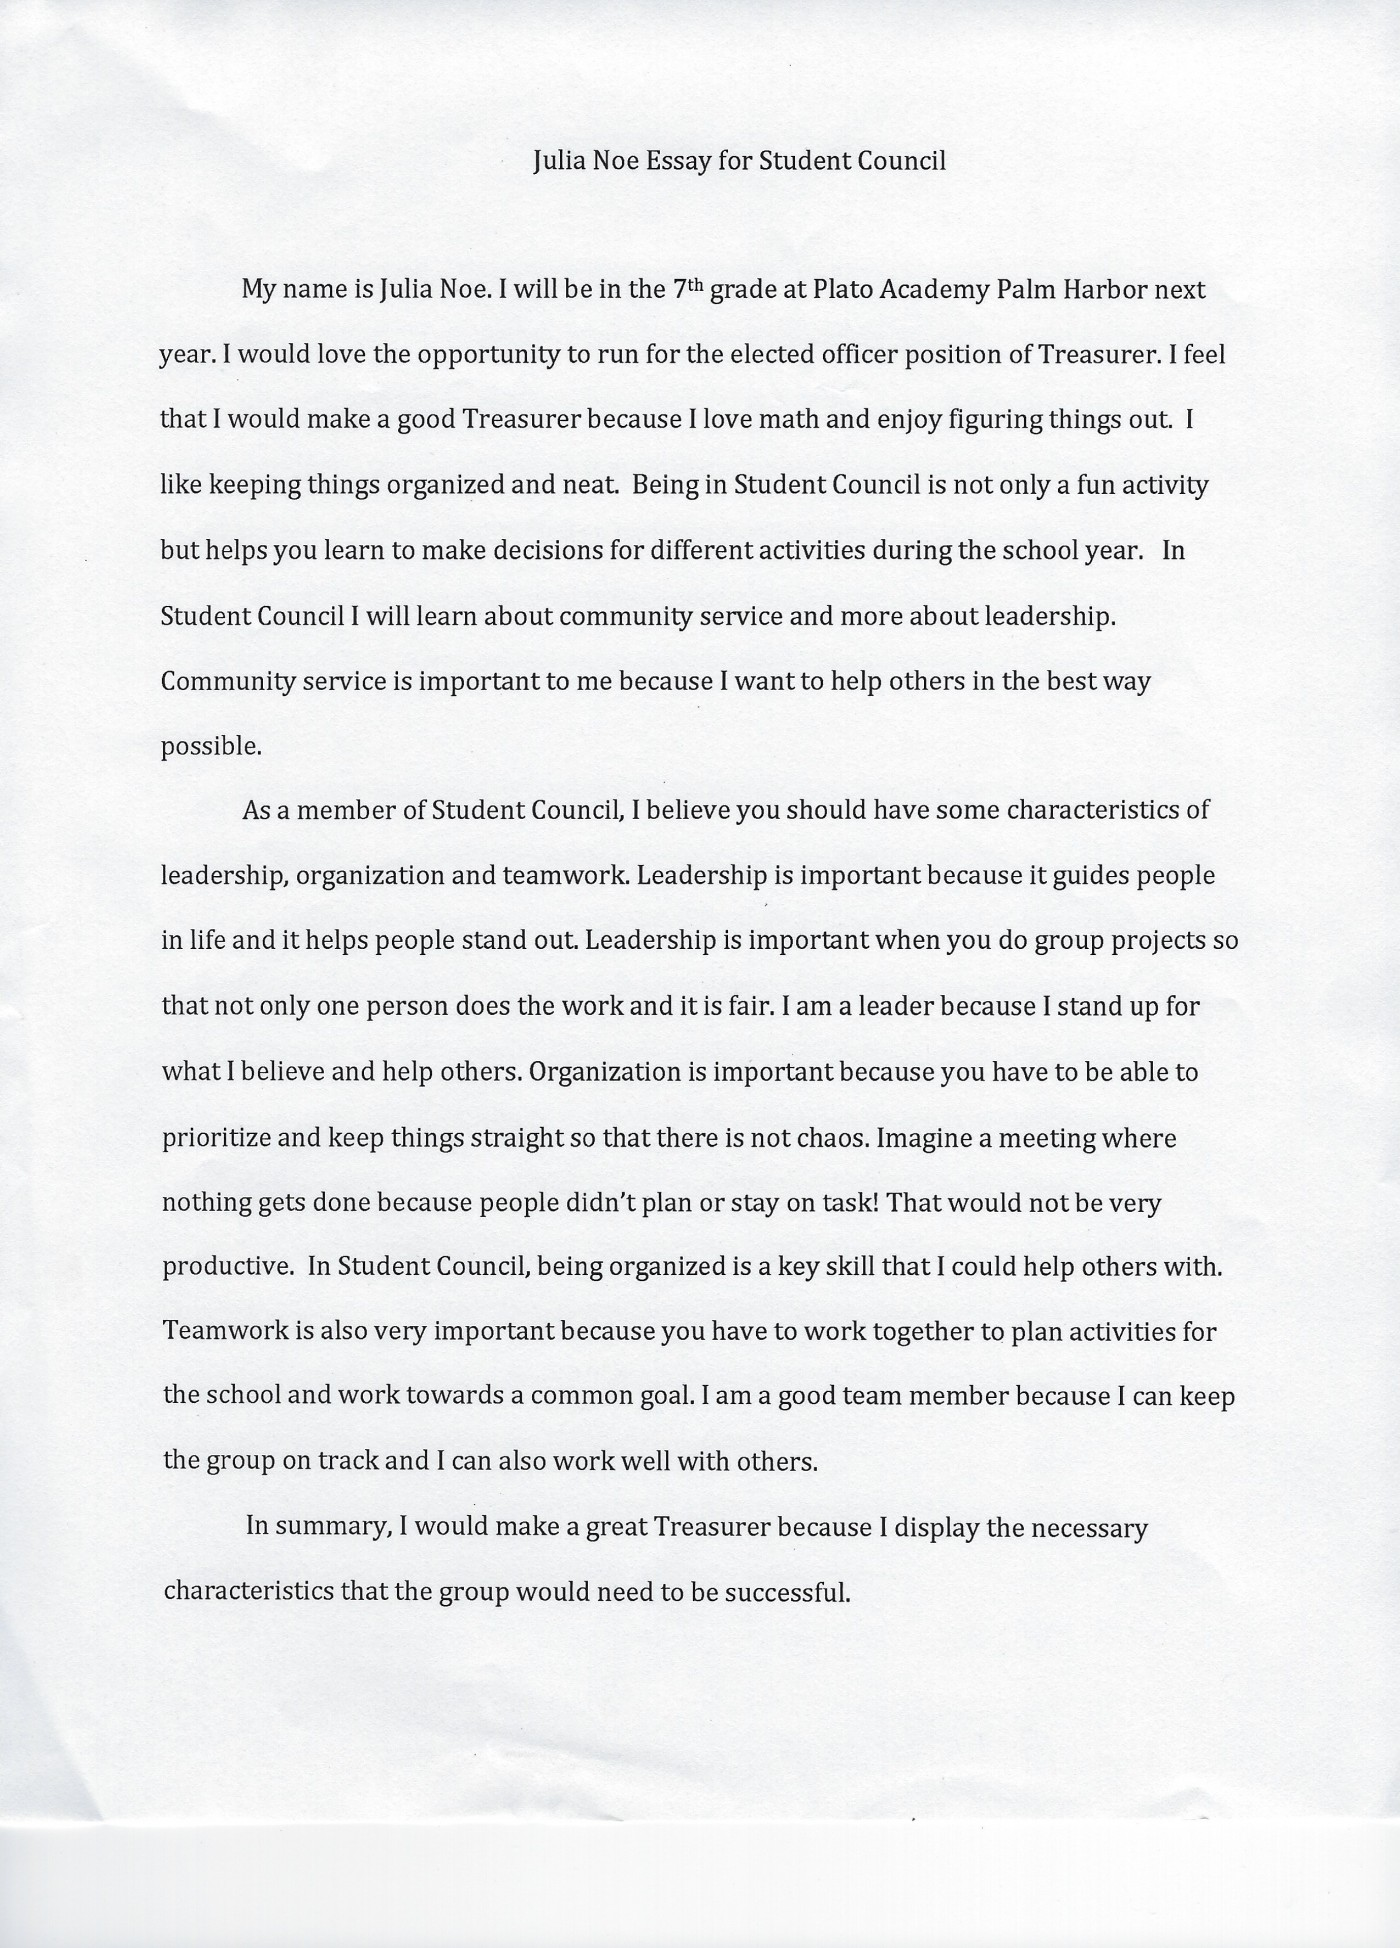 009 Student Council Essay Example Treasurer Noe Phenomenal Rubric Conclusion 1400